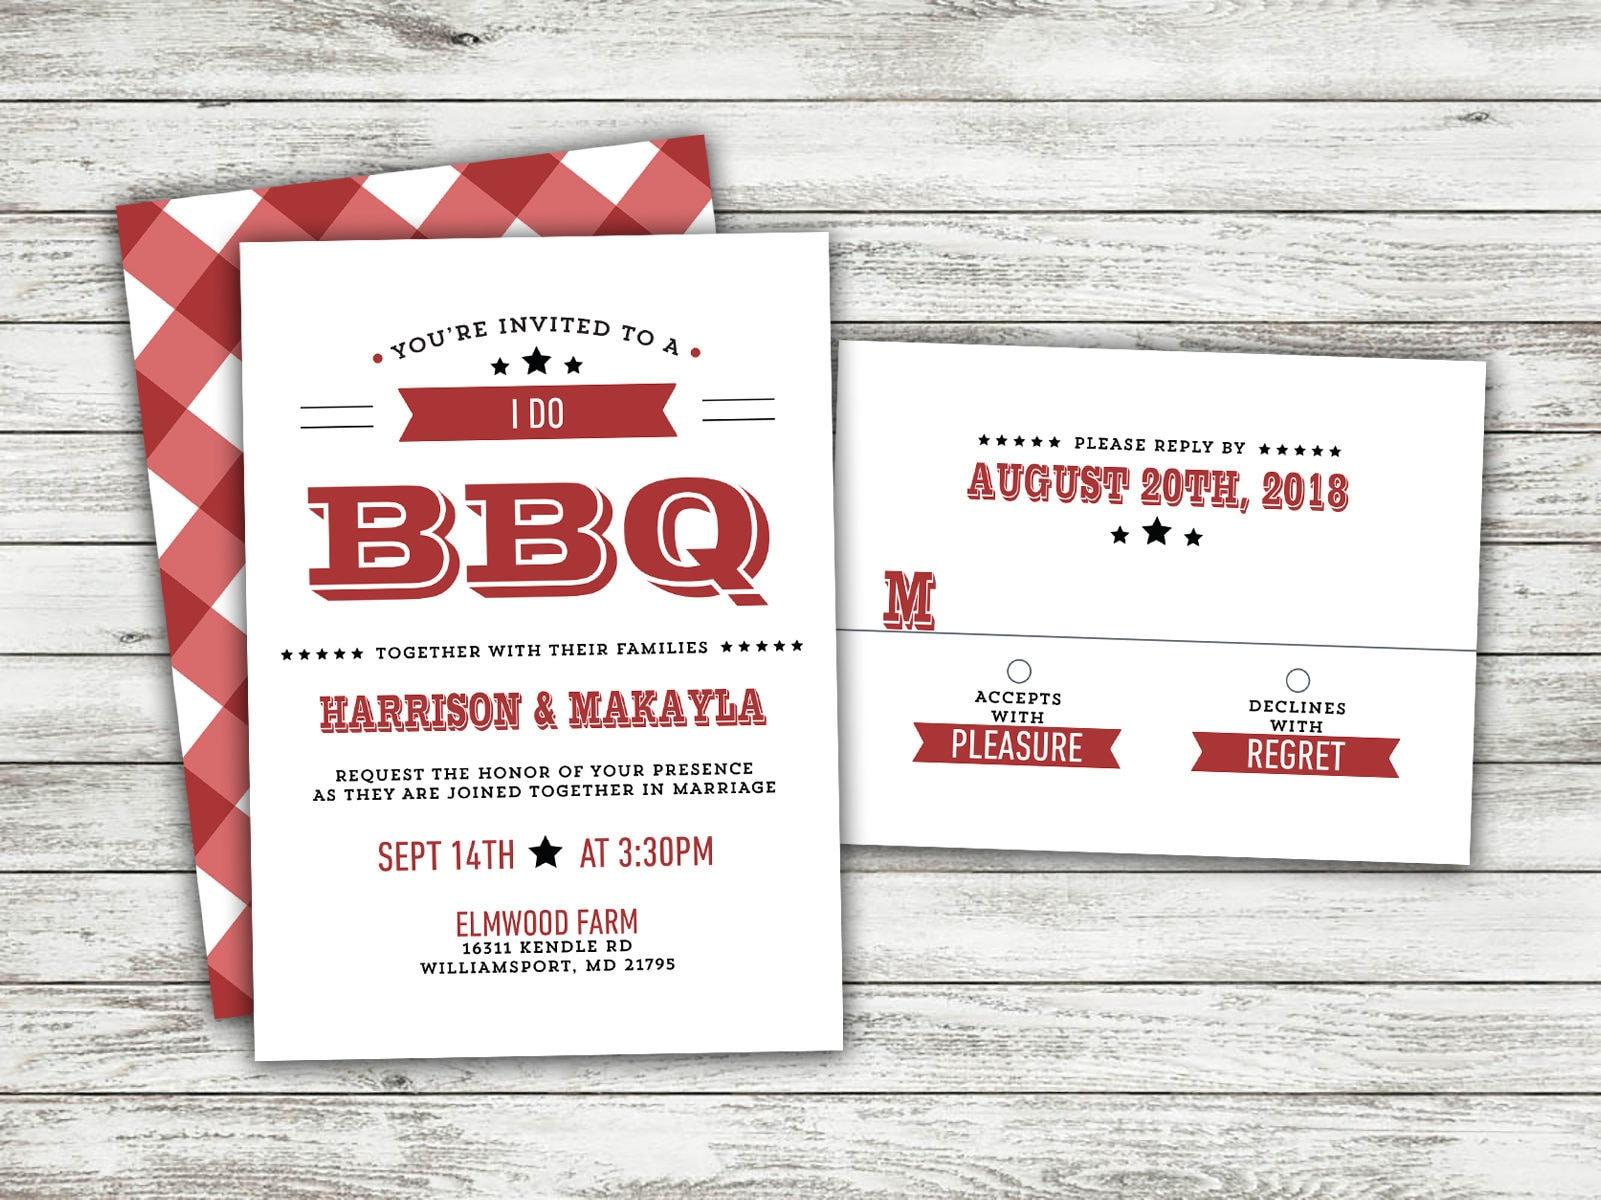 Rustic Wedding Invitation Country Wedding Invitations I Do Bbq